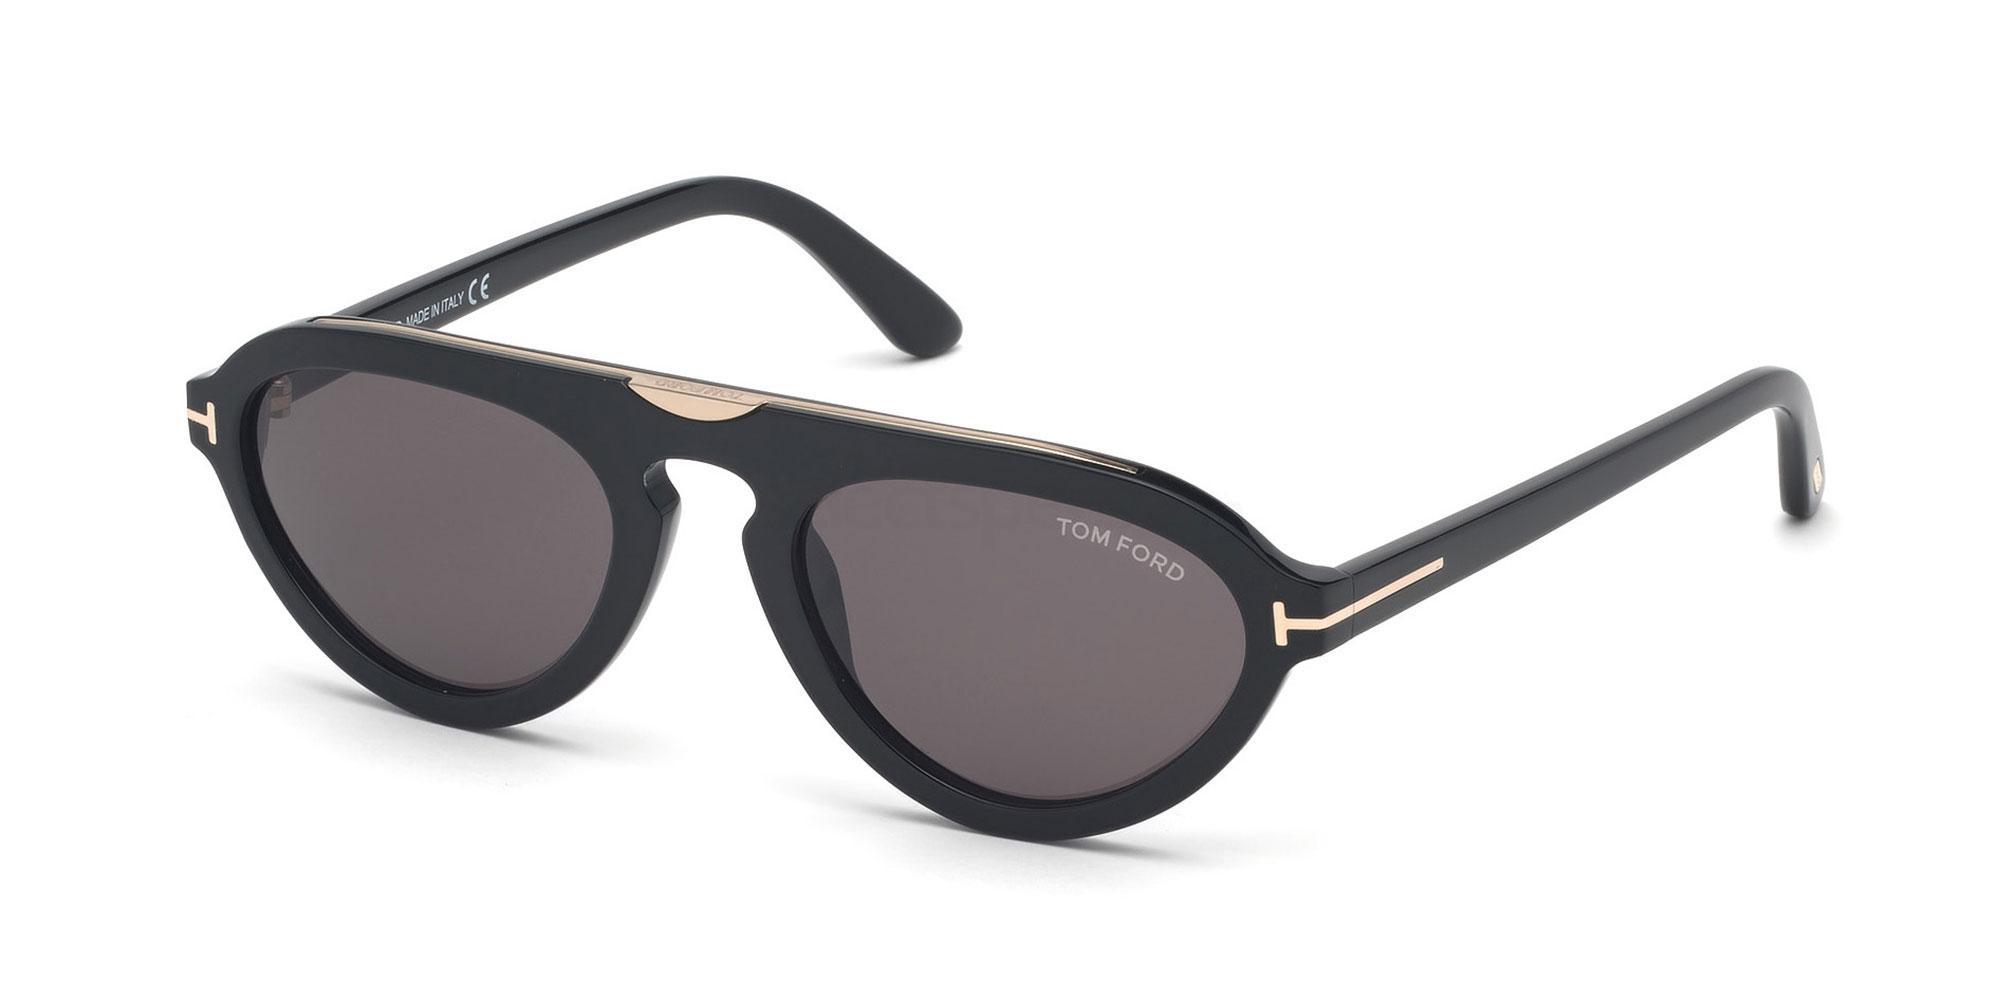 01A FT0737 Sunglasses, Tom Ford